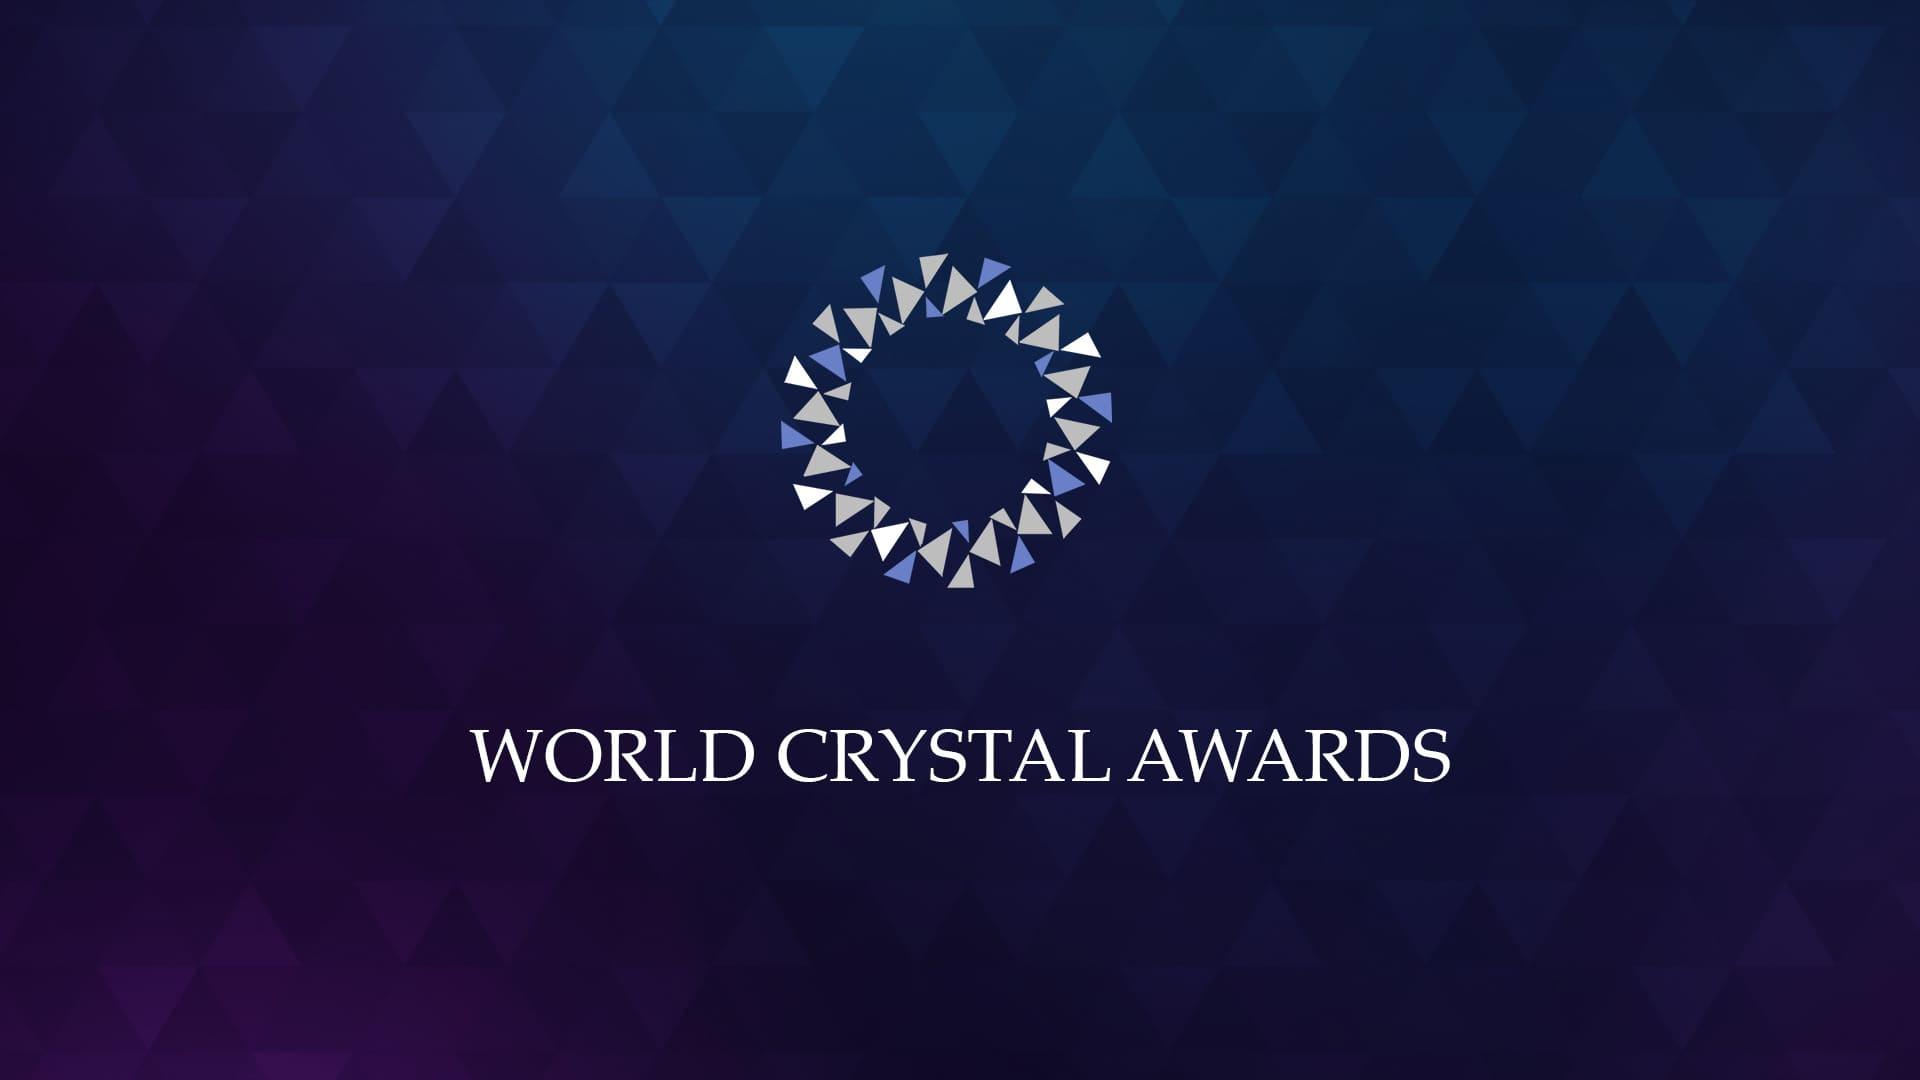 World Crystal Awards